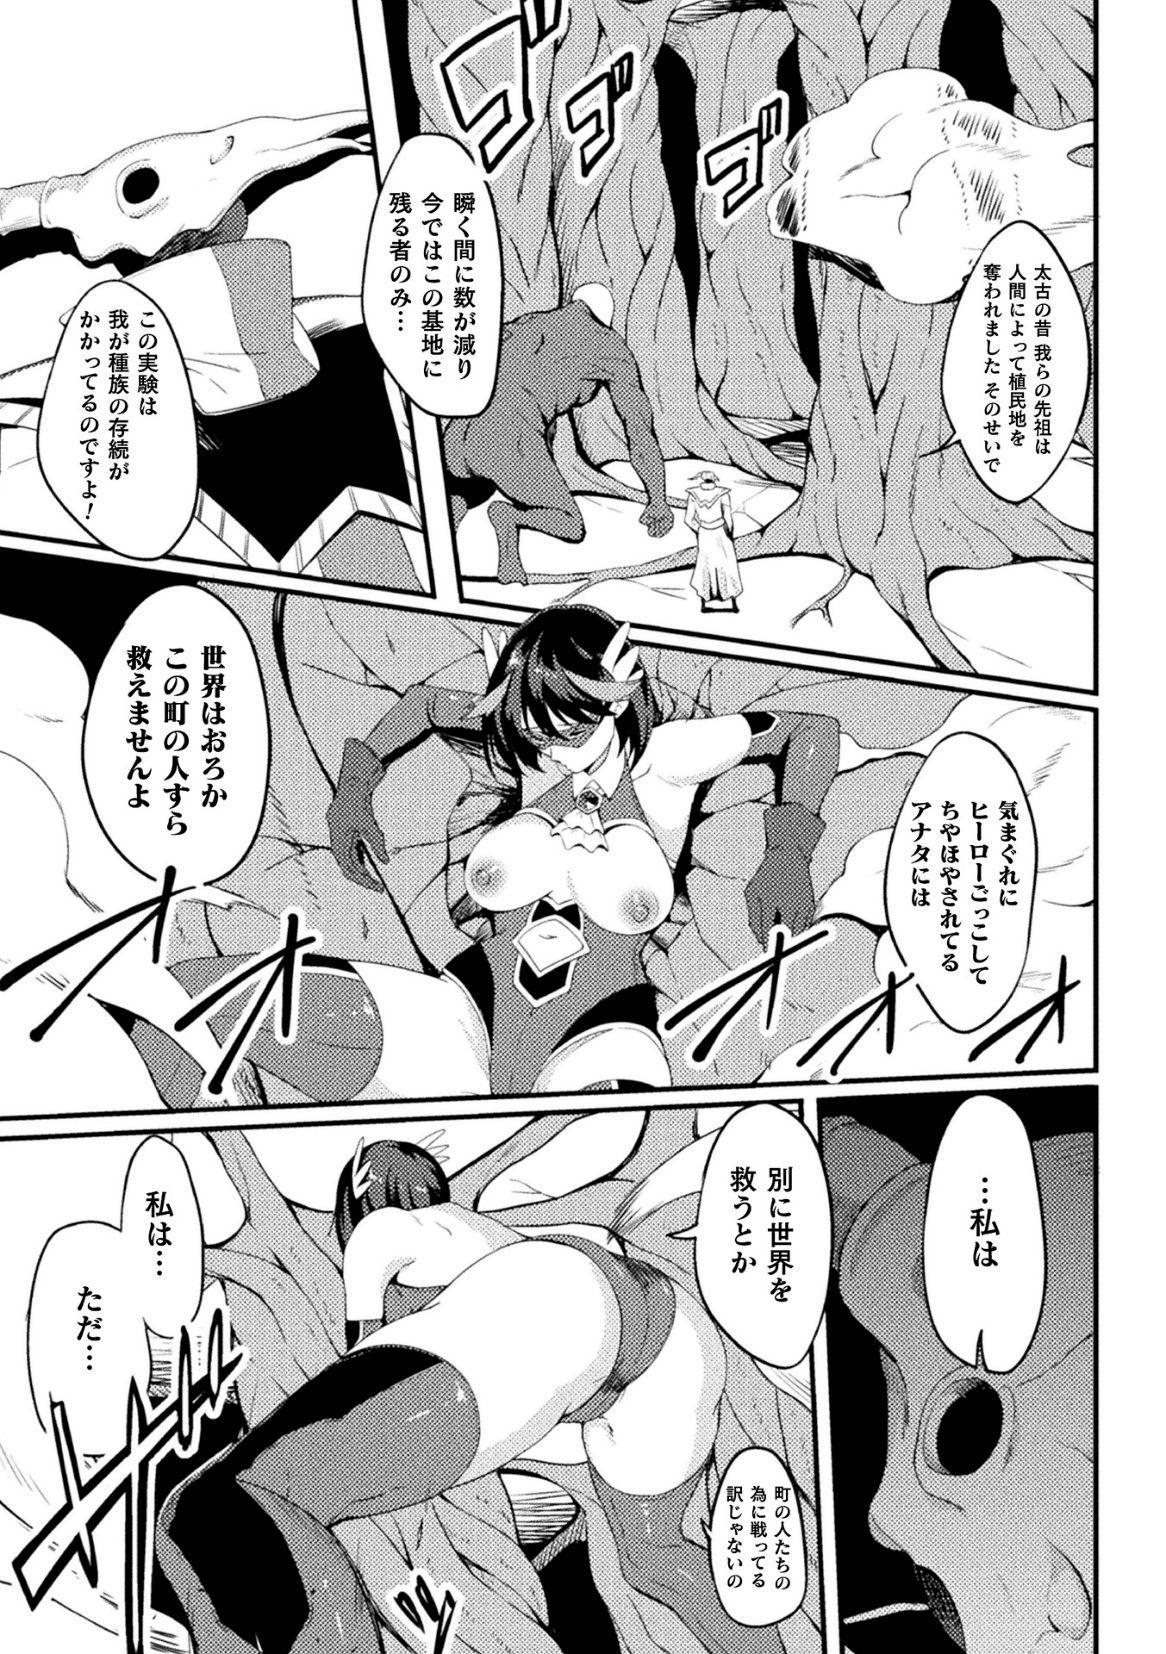 [Rinsun] Power Girl ~JK Super Heroine no Saiin Darakuki~ Ch. 2 6